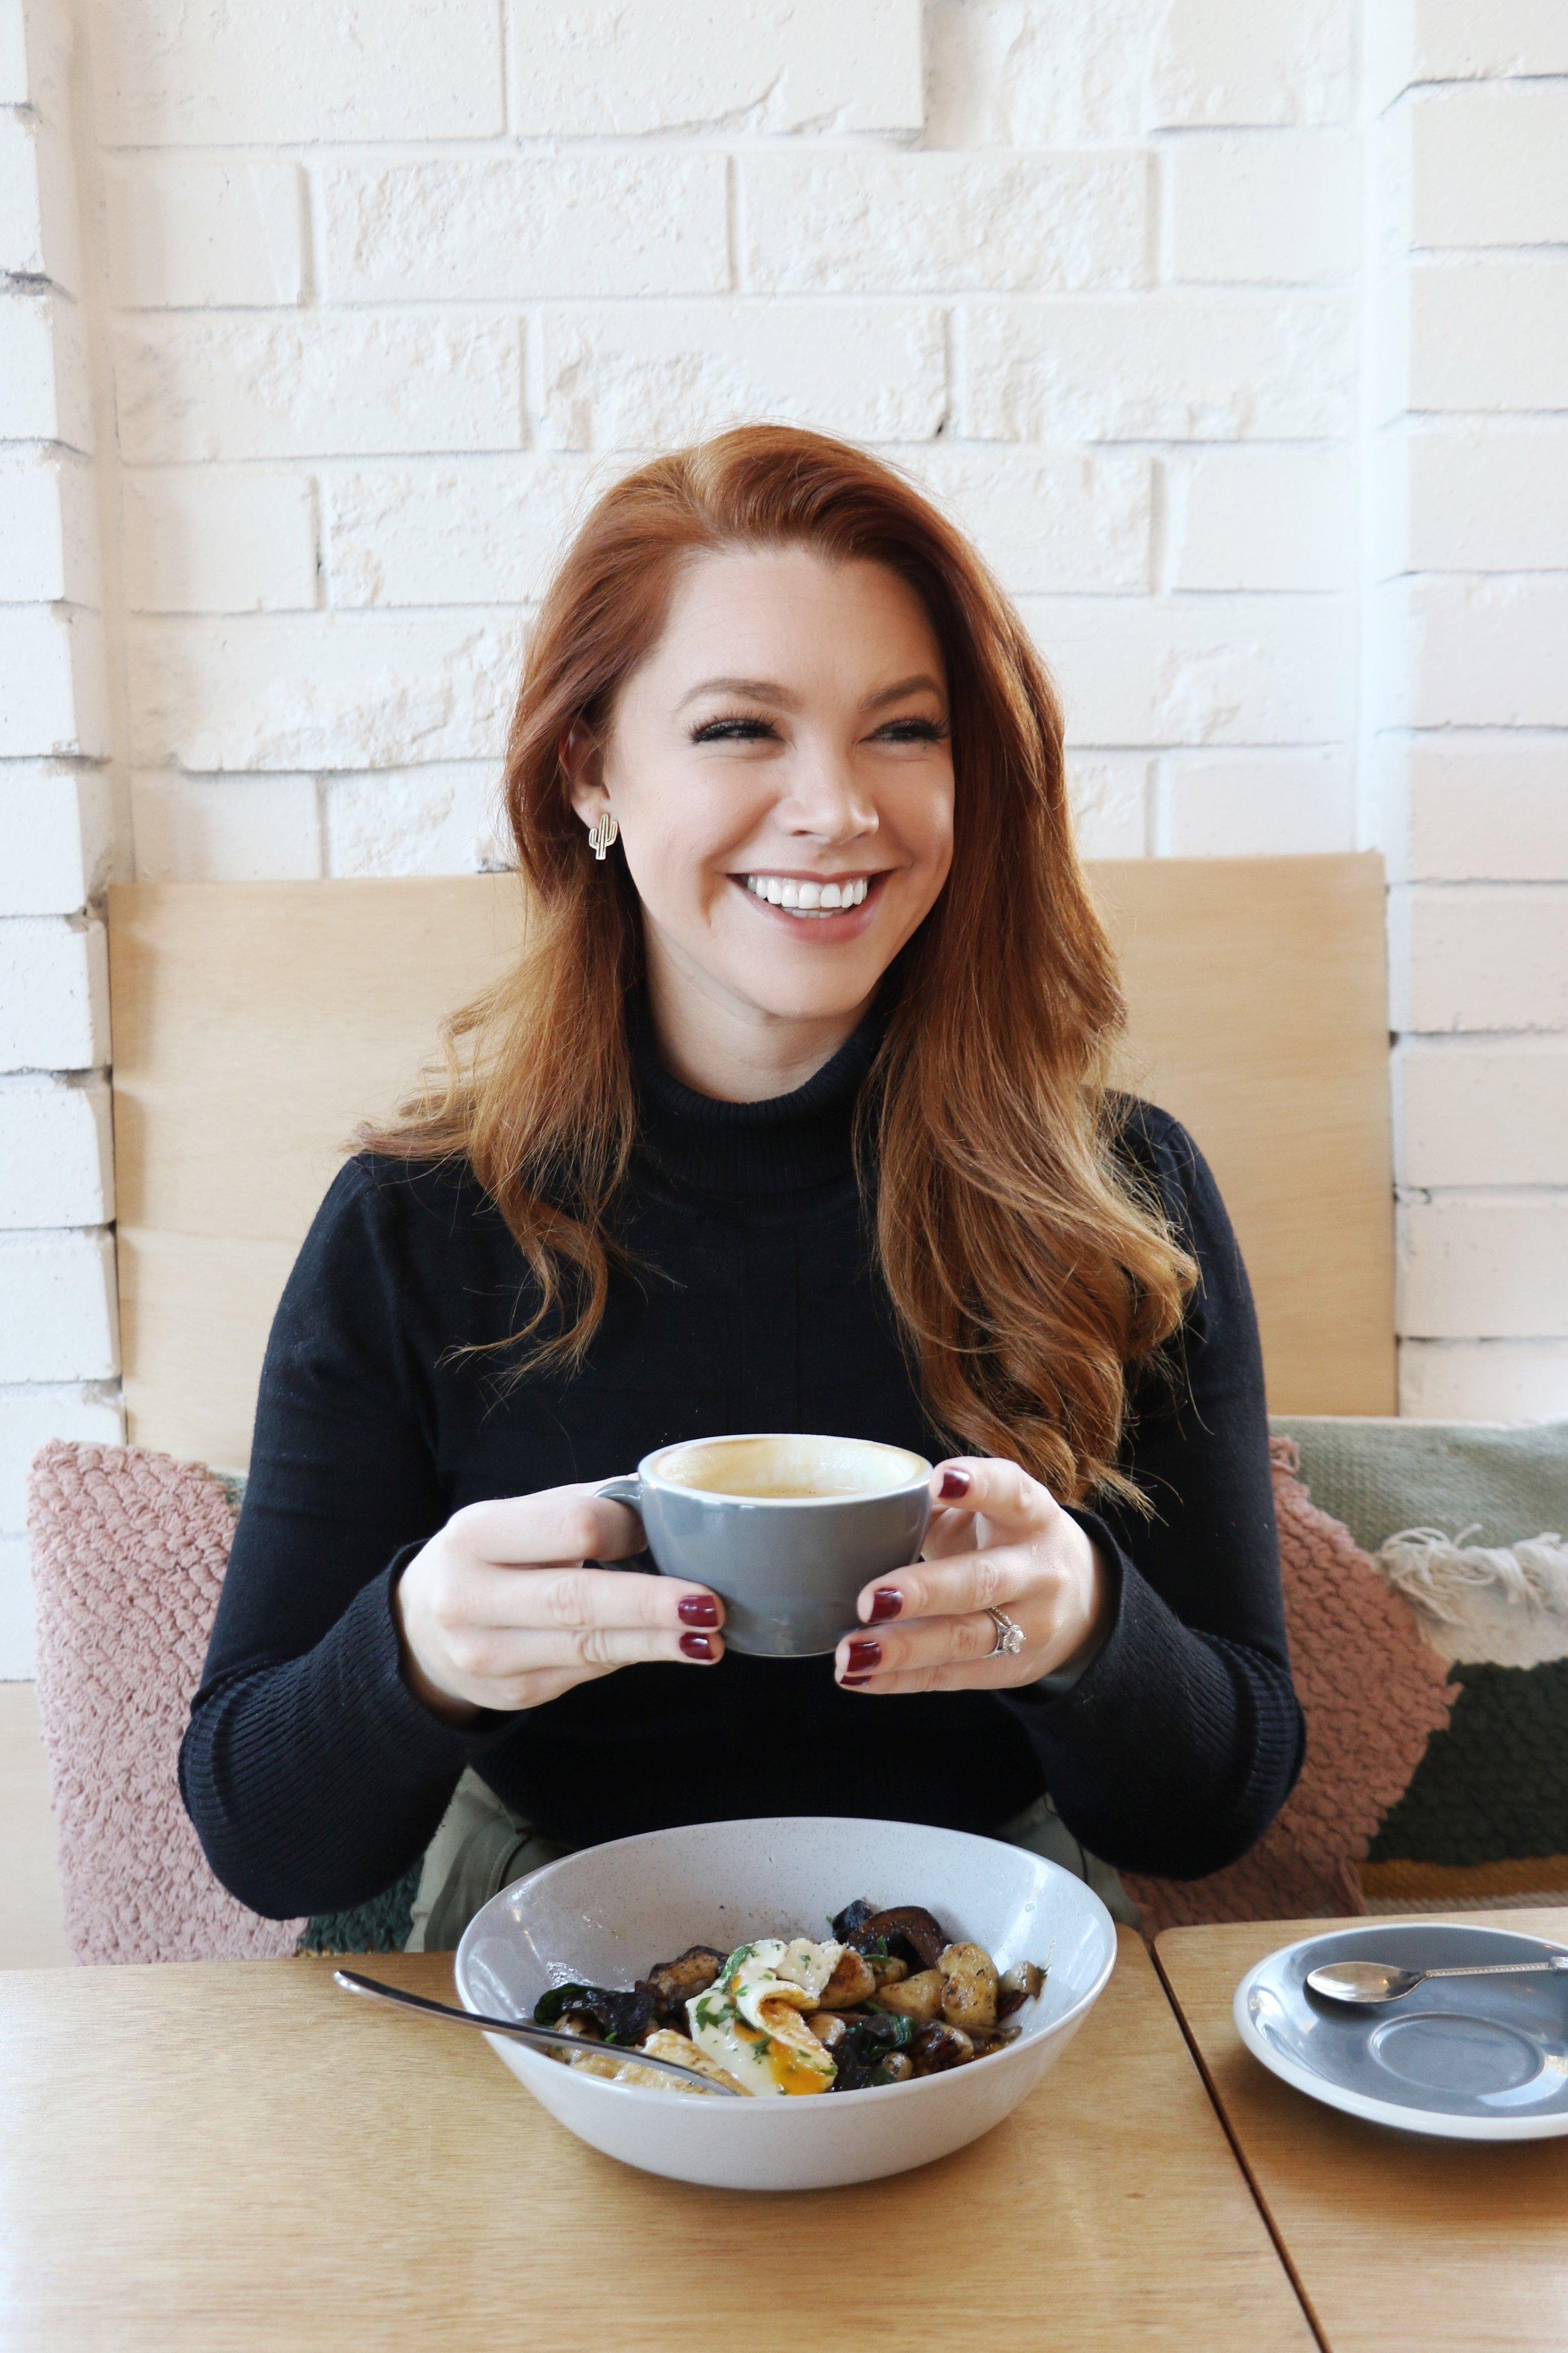 Caffeine makes me smile